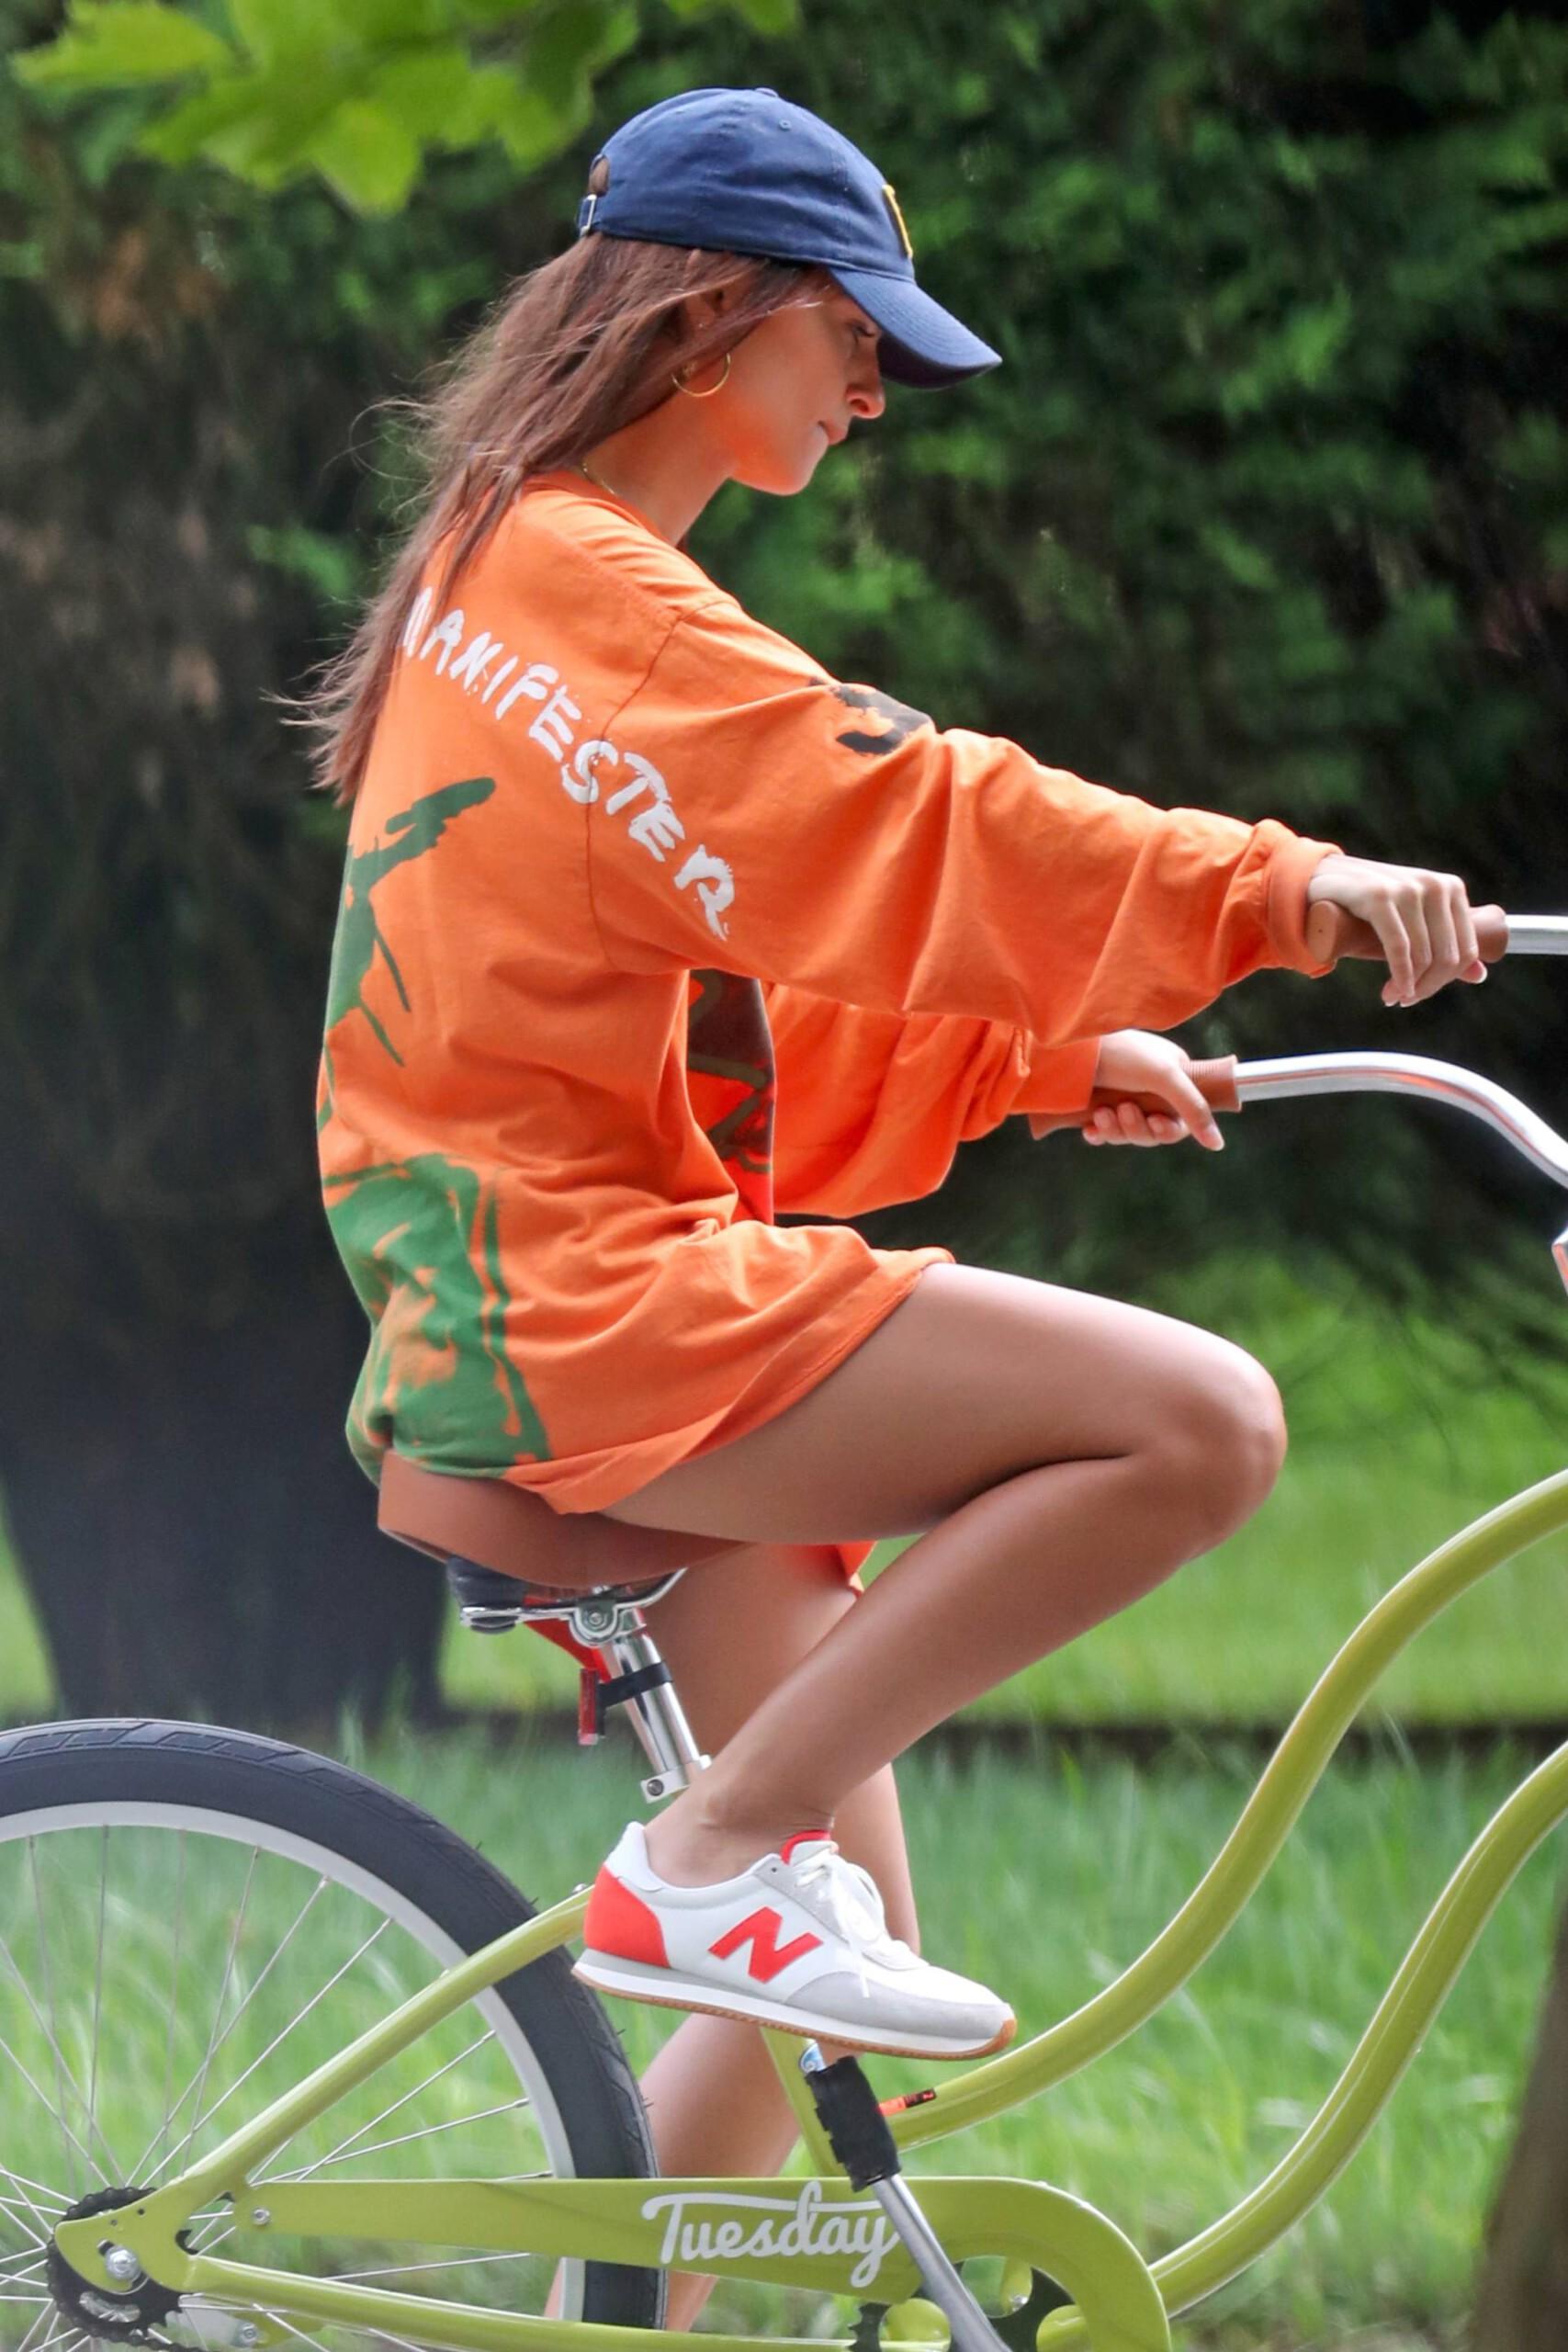 Emily Ratajkowski Sexy Legs And Upskirt